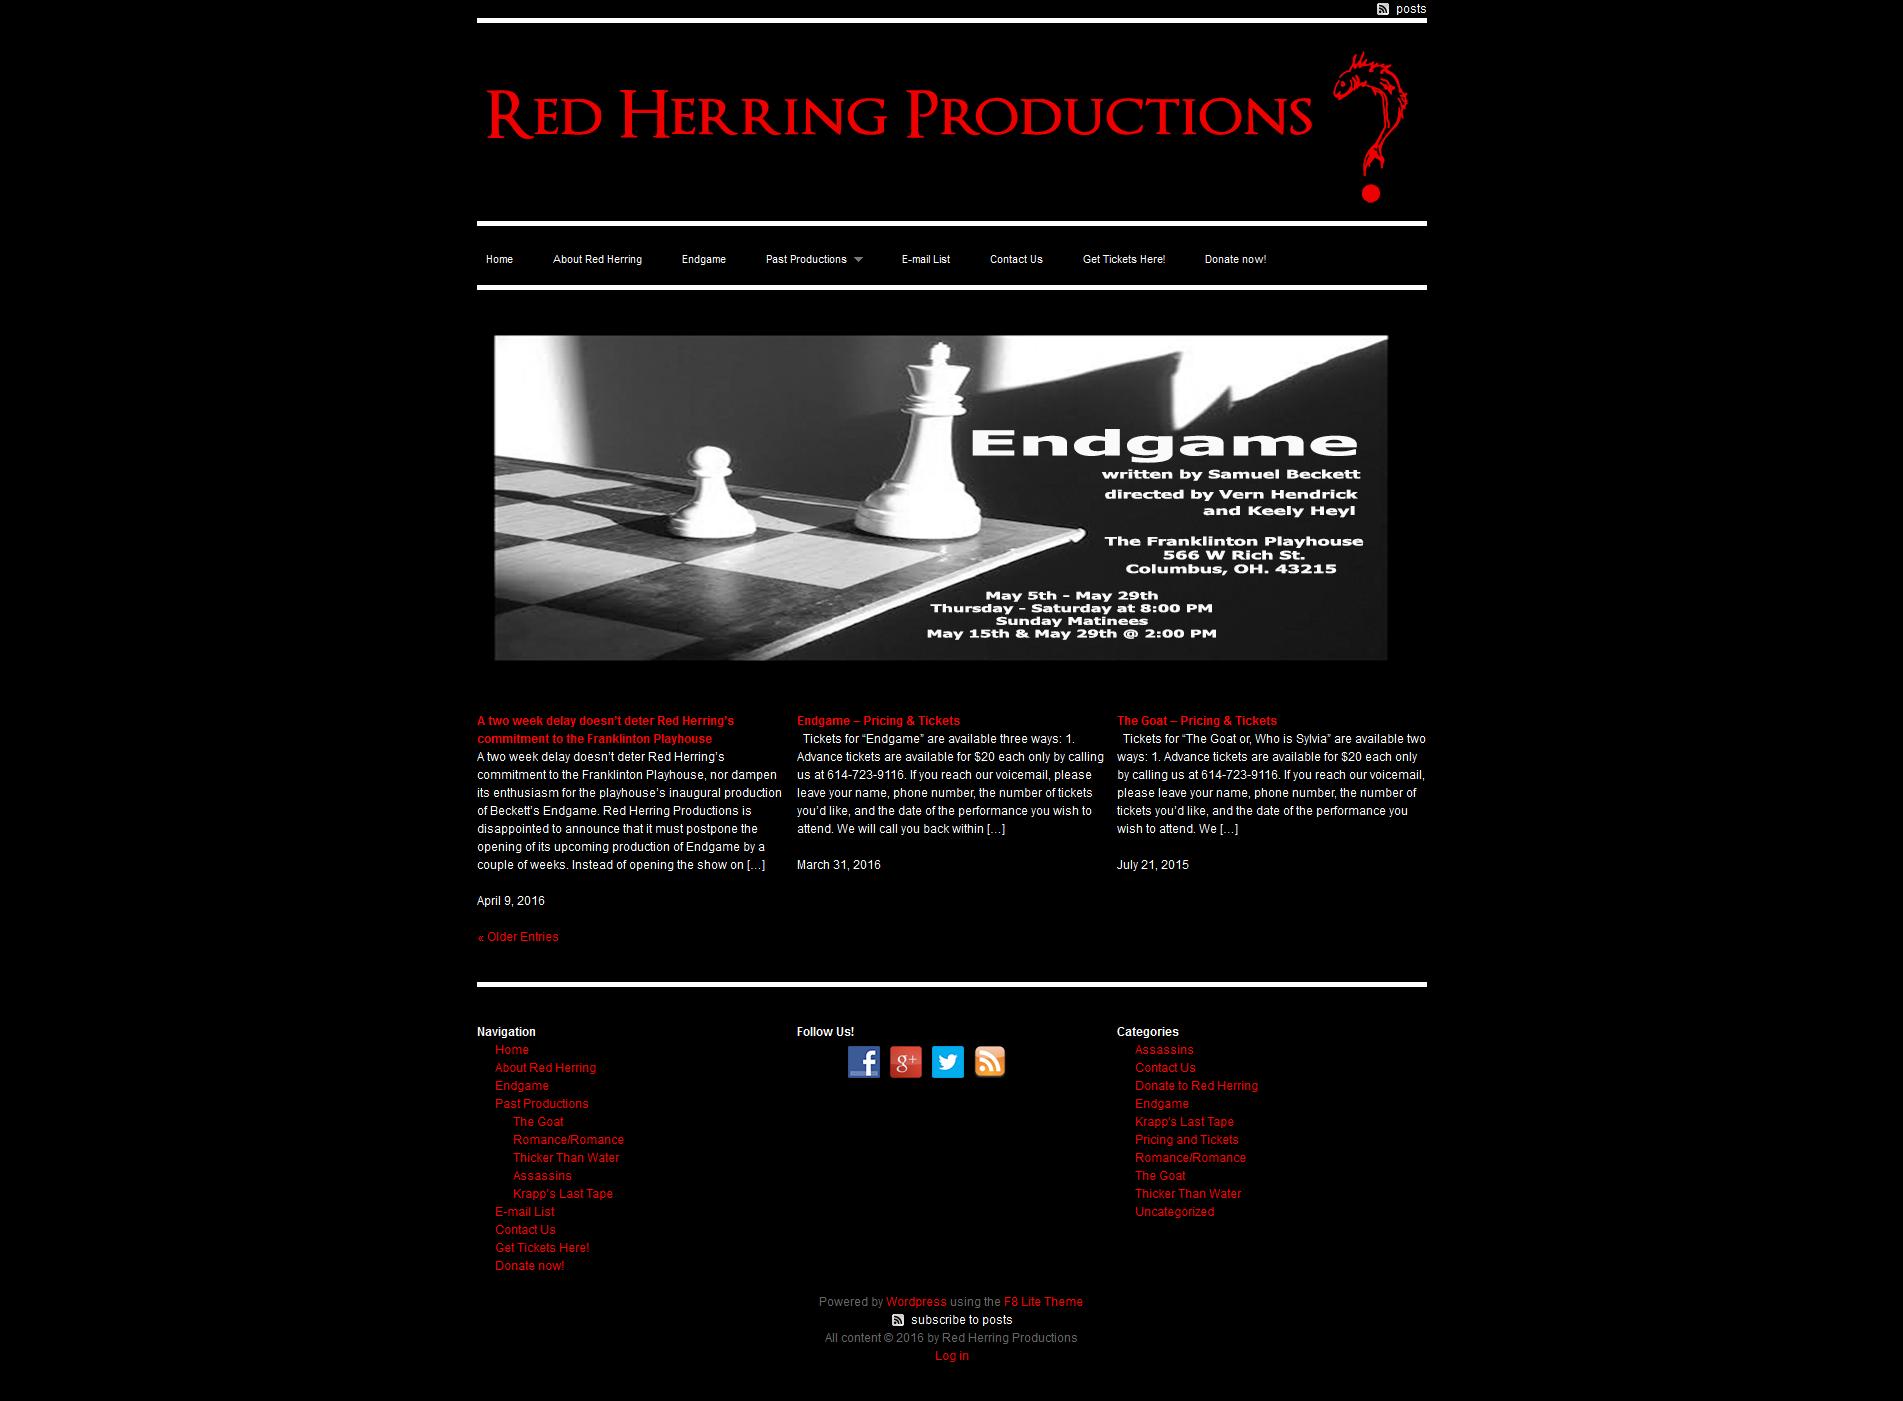 Homepage - Before